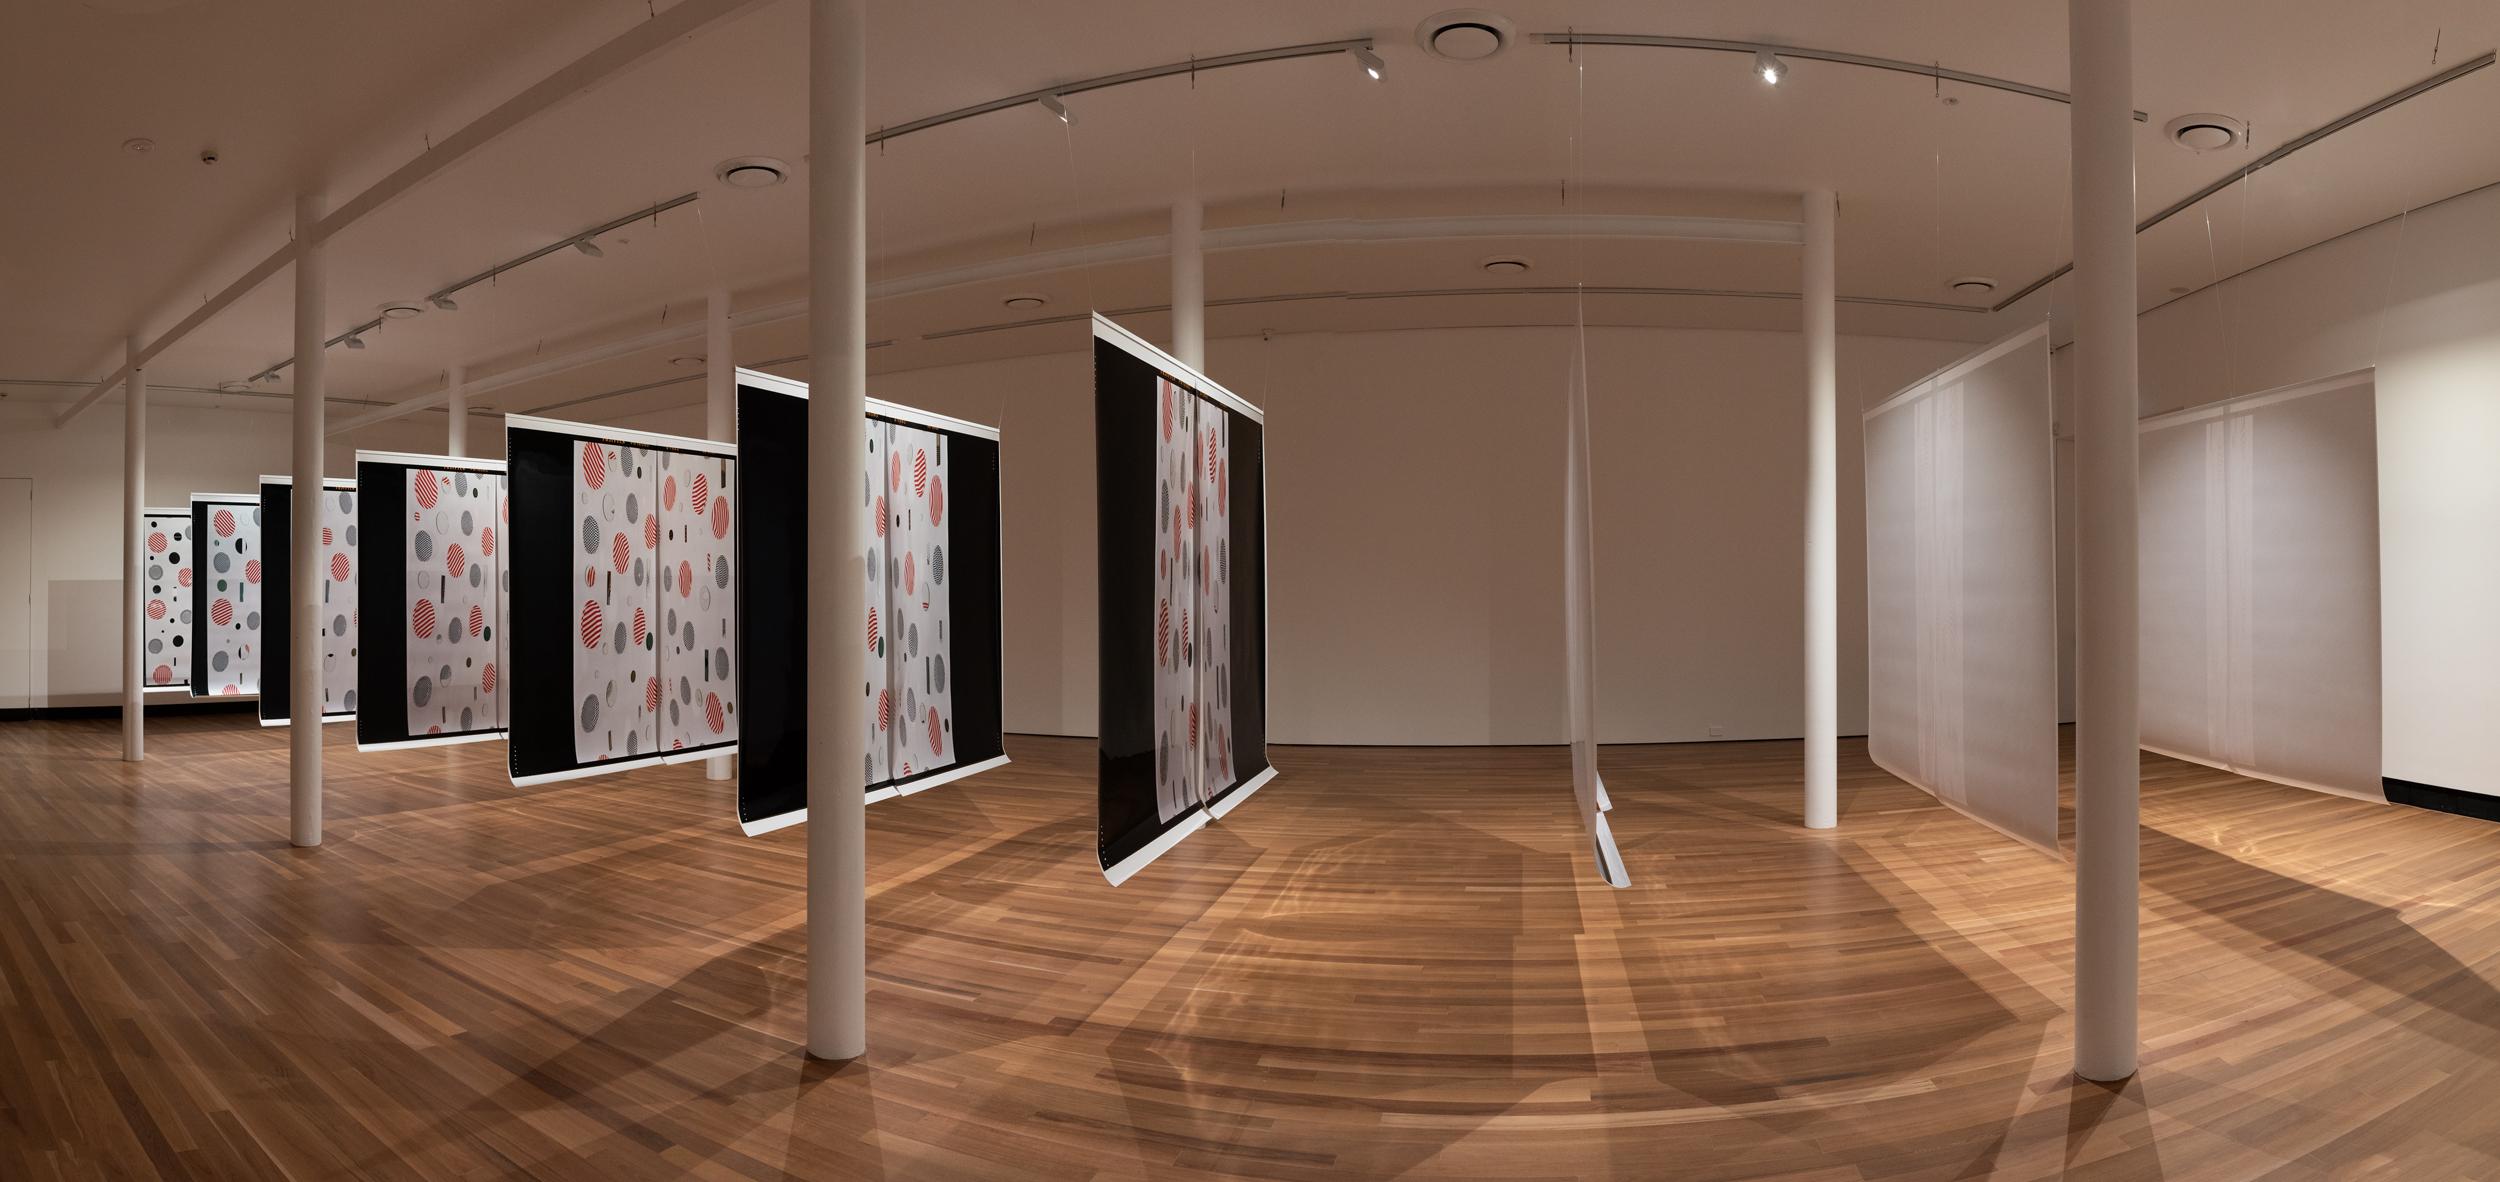 5..Jacky Redgate Light Throw (Mirrors) Fold, 2014-15.jpg